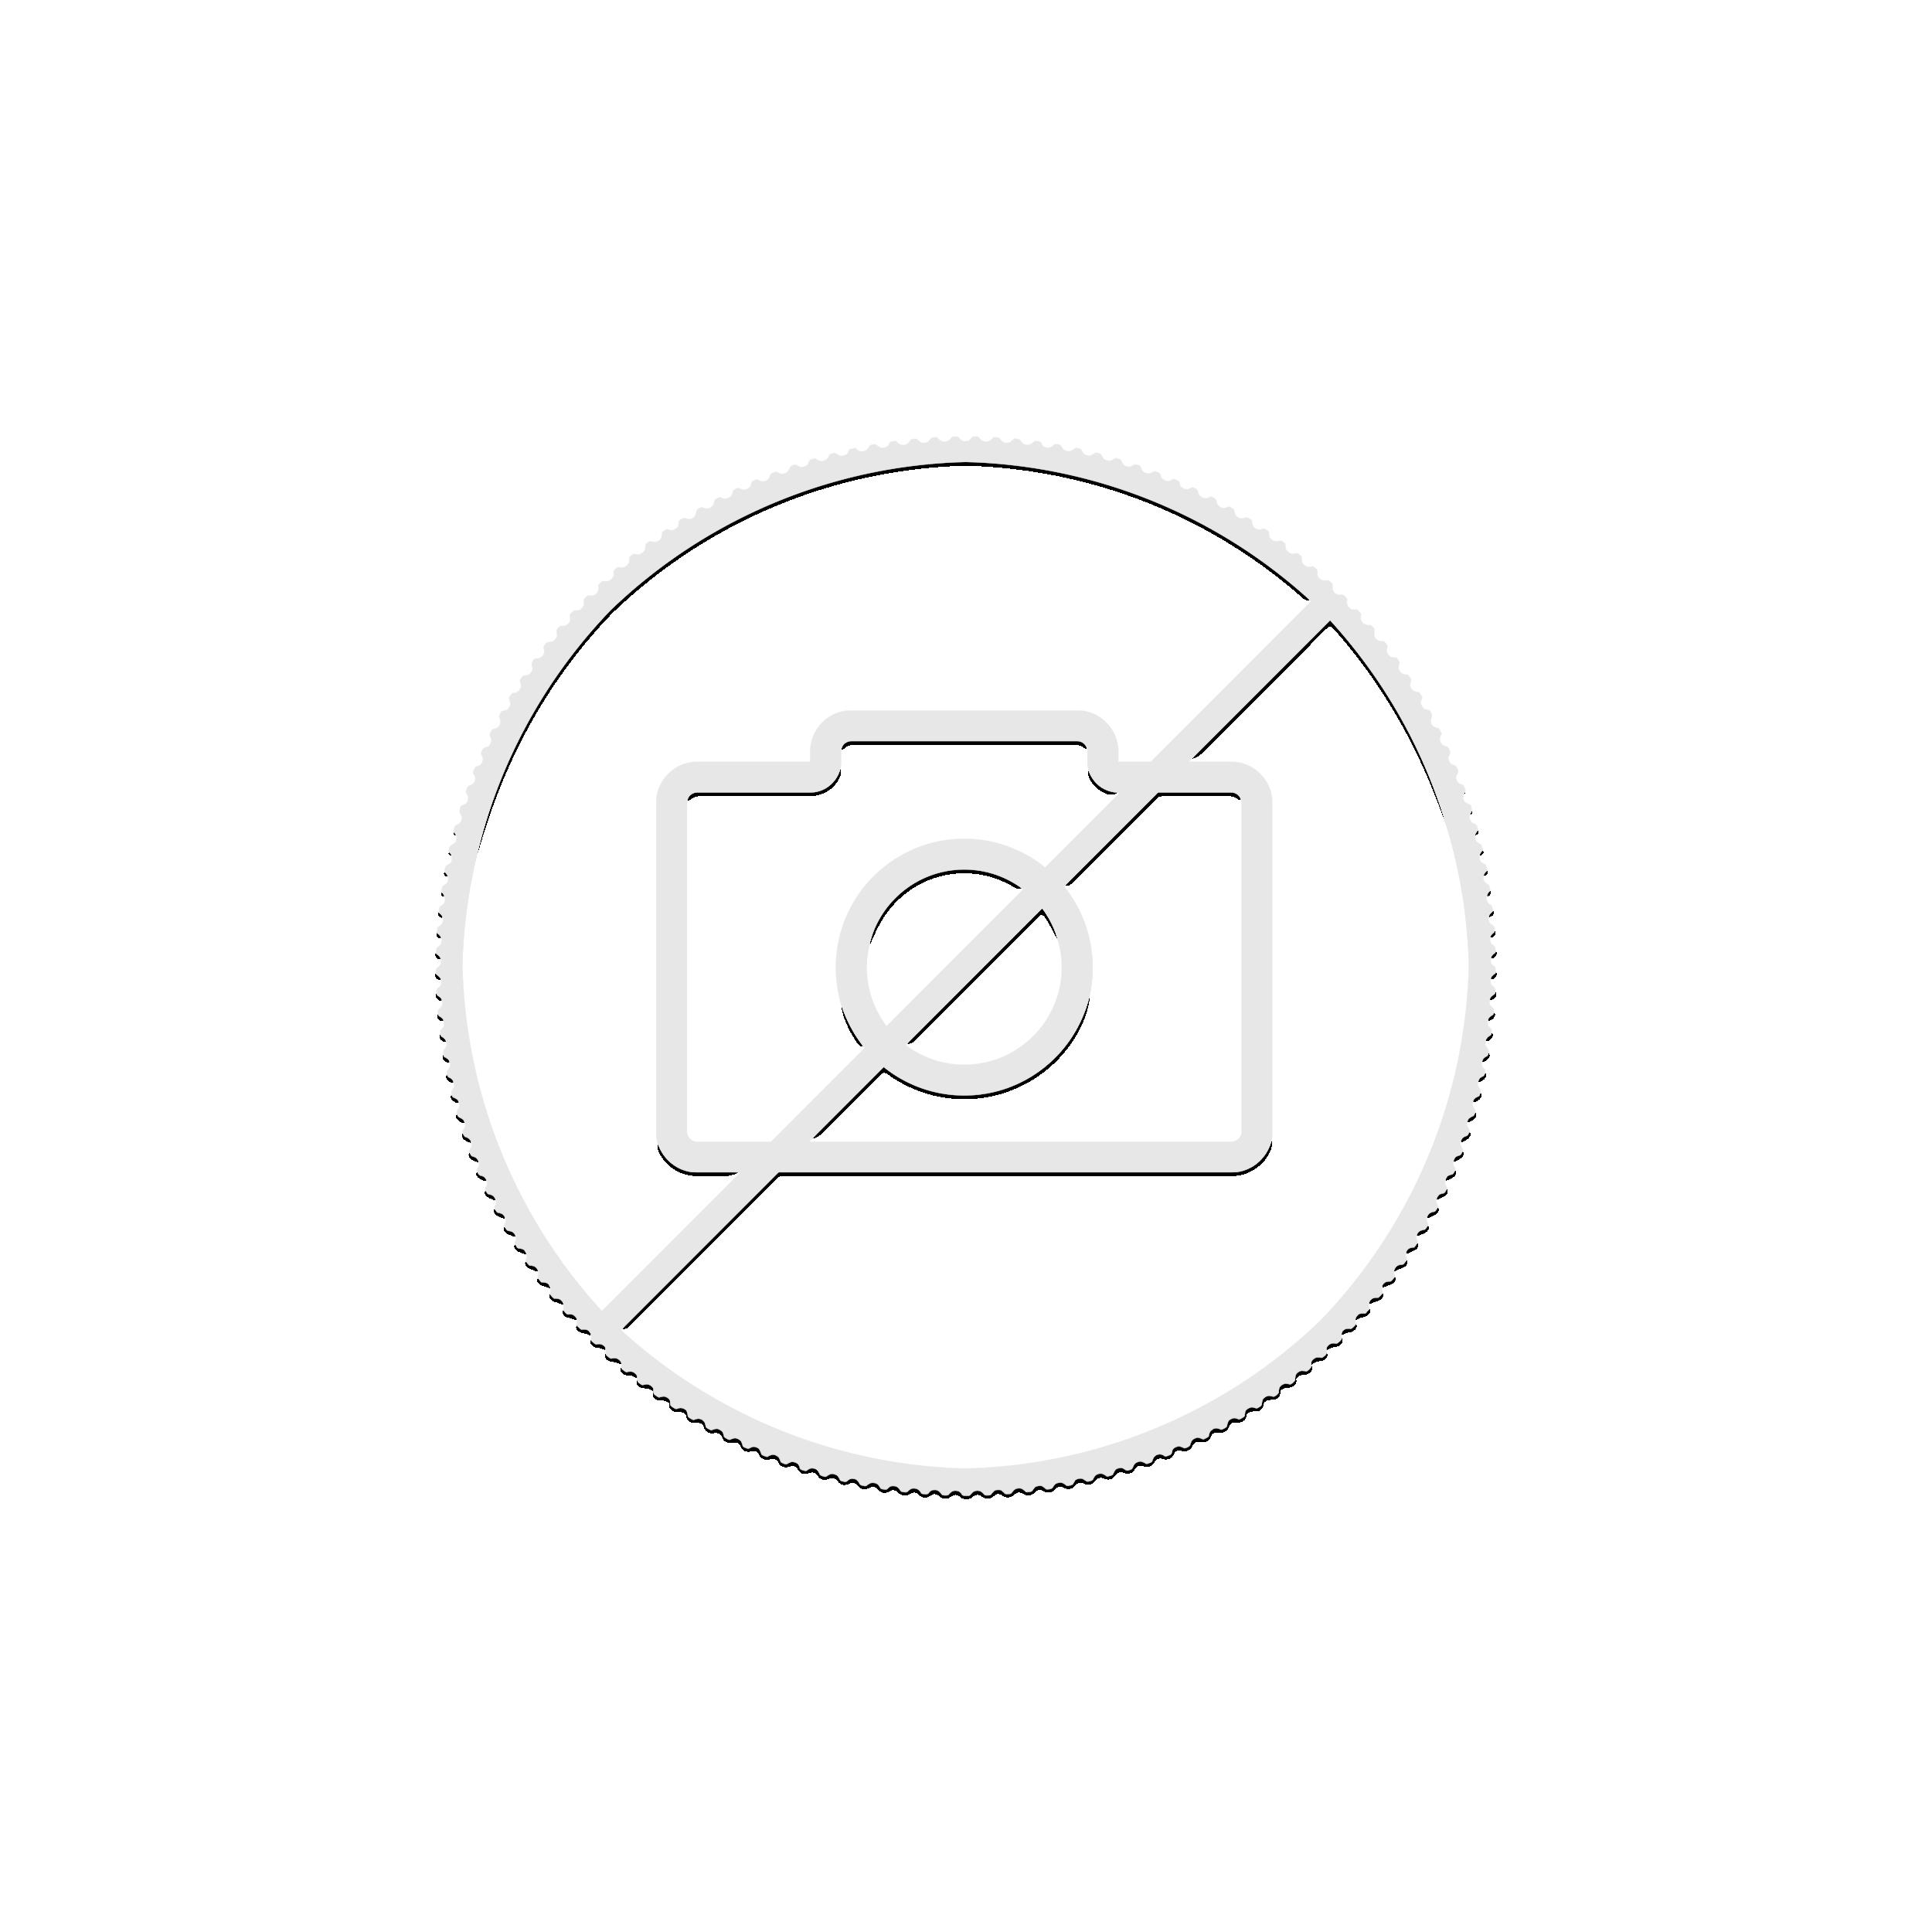 1 Gram gouden Panda munt 2017